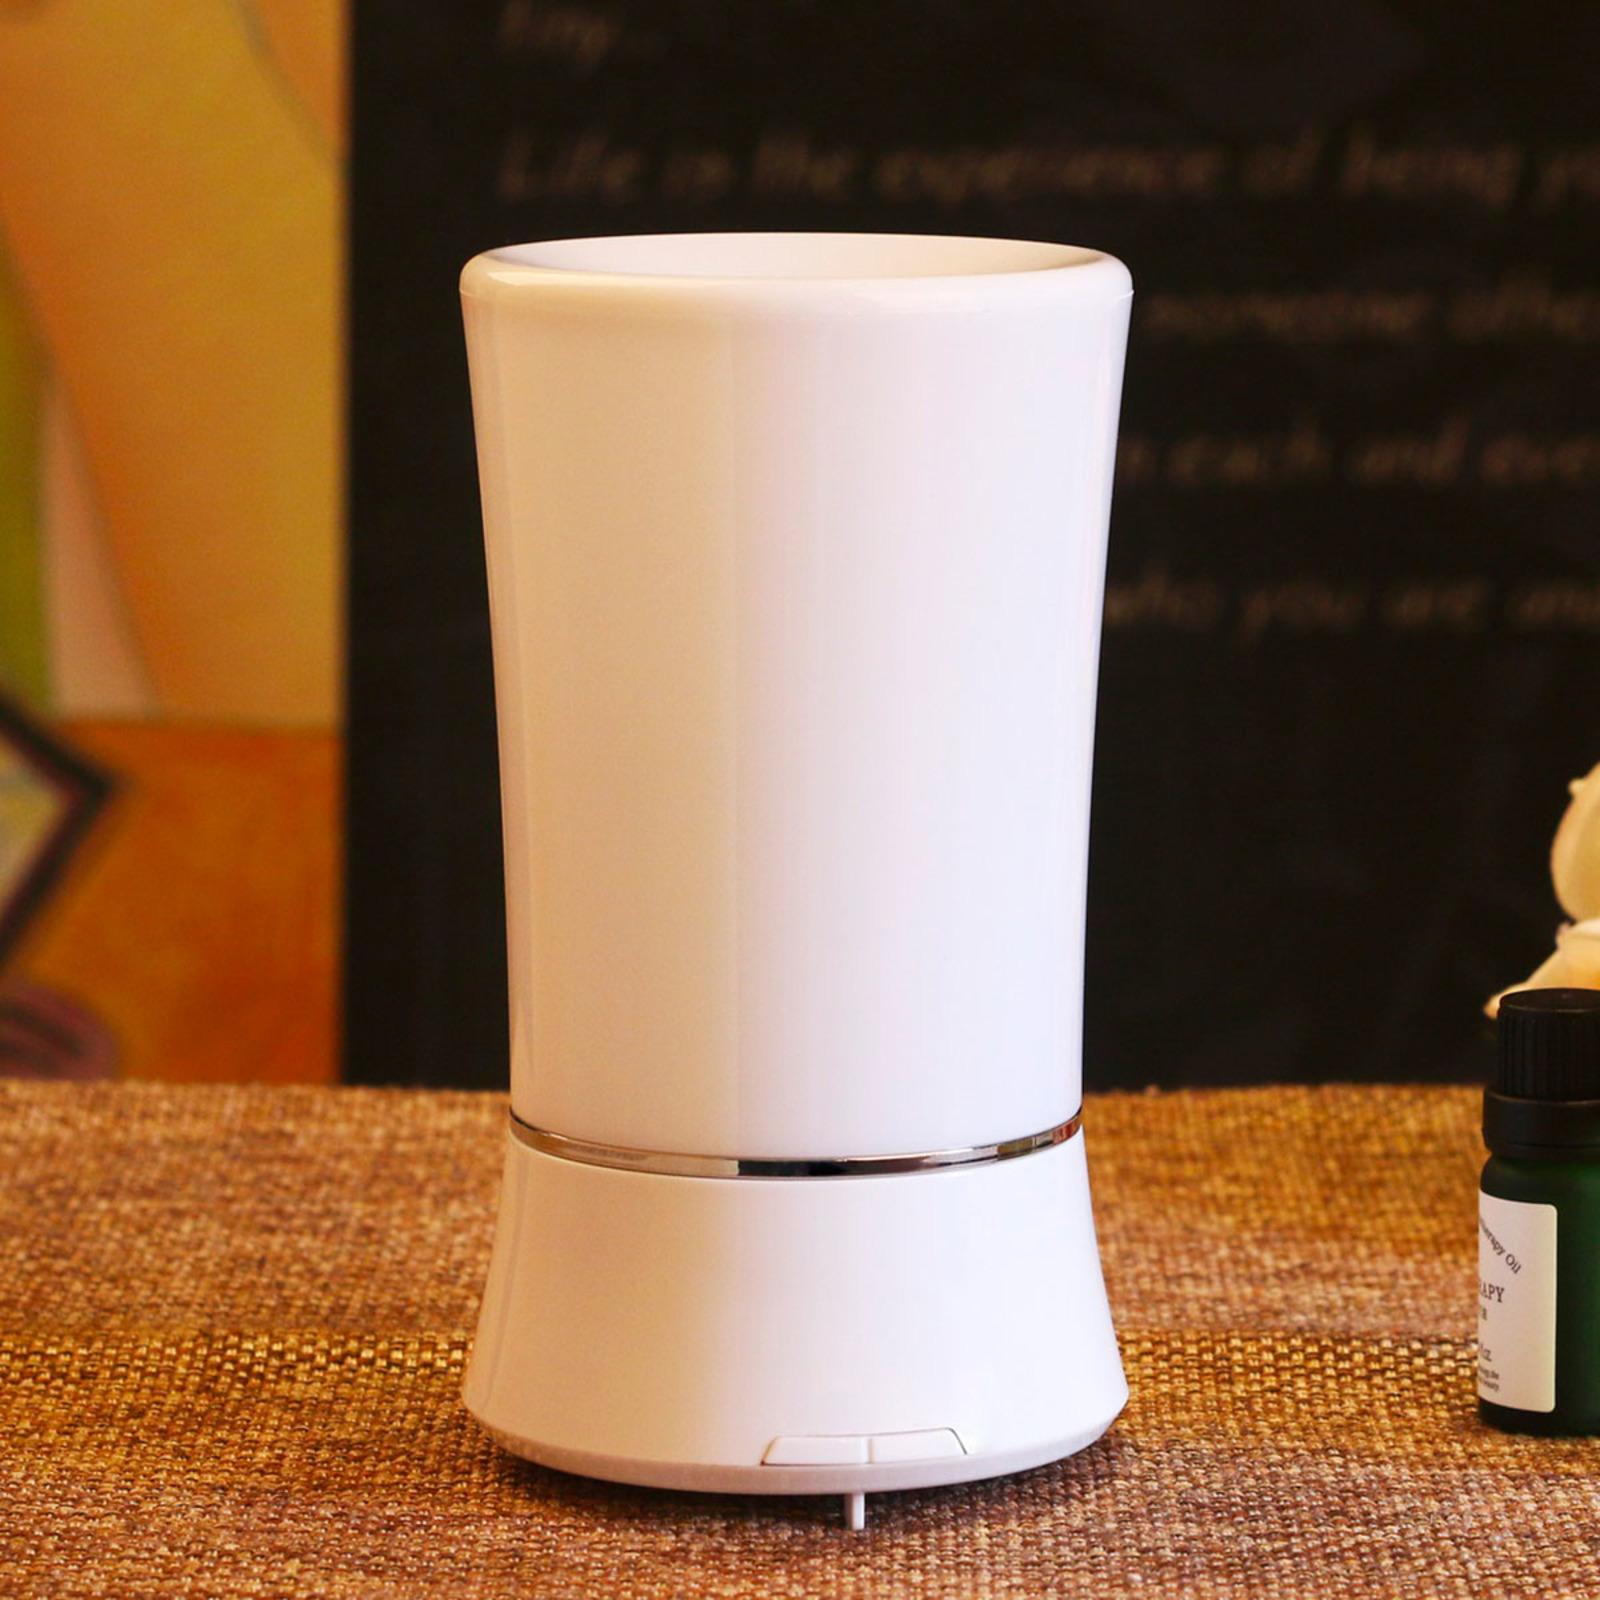 Biofinest B1 Ultrasonic Aroma Diffuser Humidifier